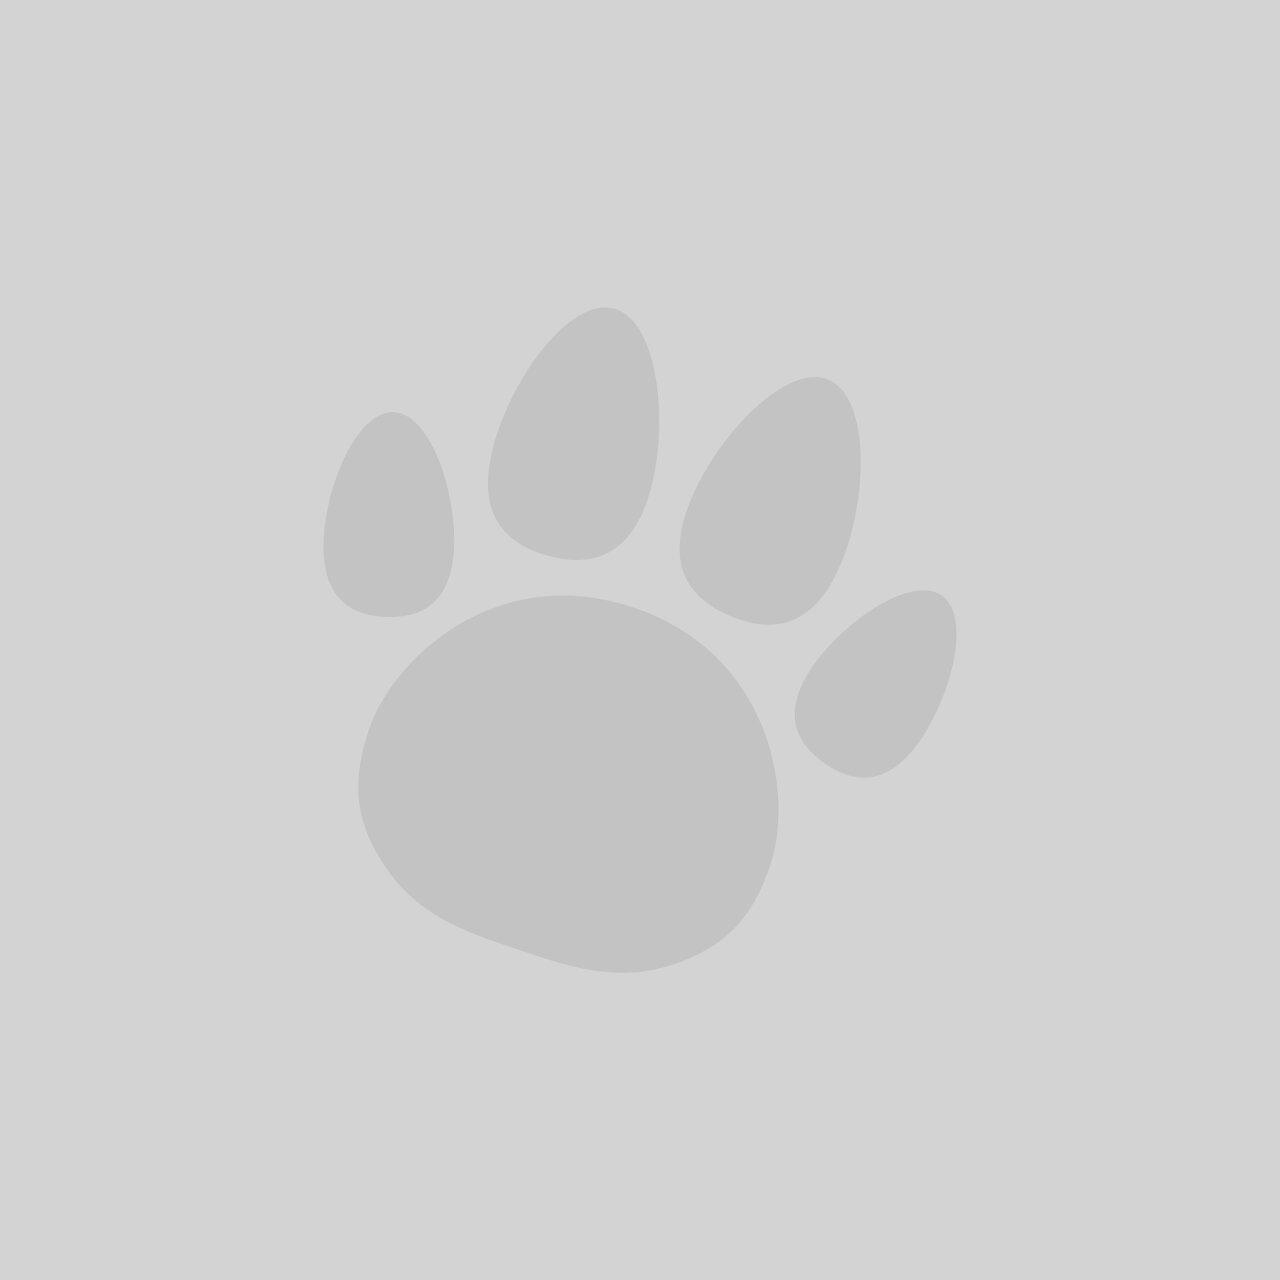 Hill's Science Plan Adult Medium Dry Dog Food Lamb & Rice Flavour 2.5kg